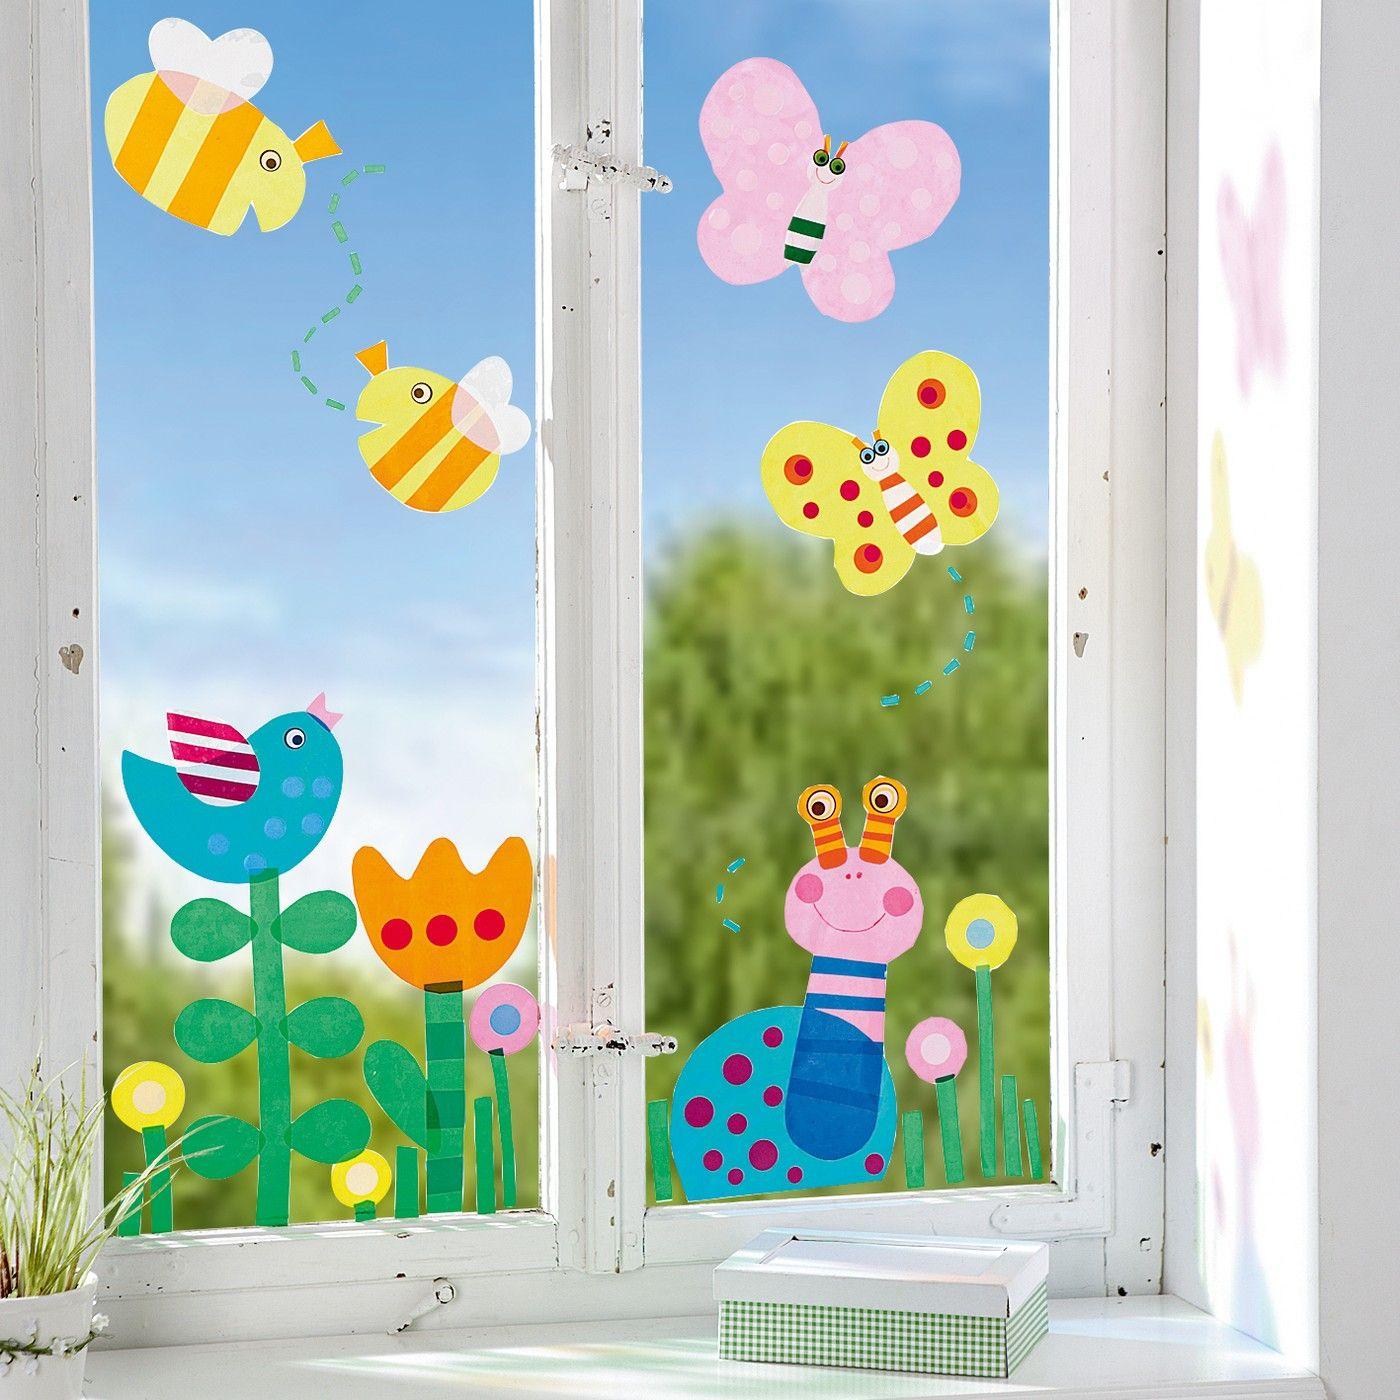 Window decoration for kindergarten  fensterfolie frühling jakoo  ipc  pinterest  kindergarten jar